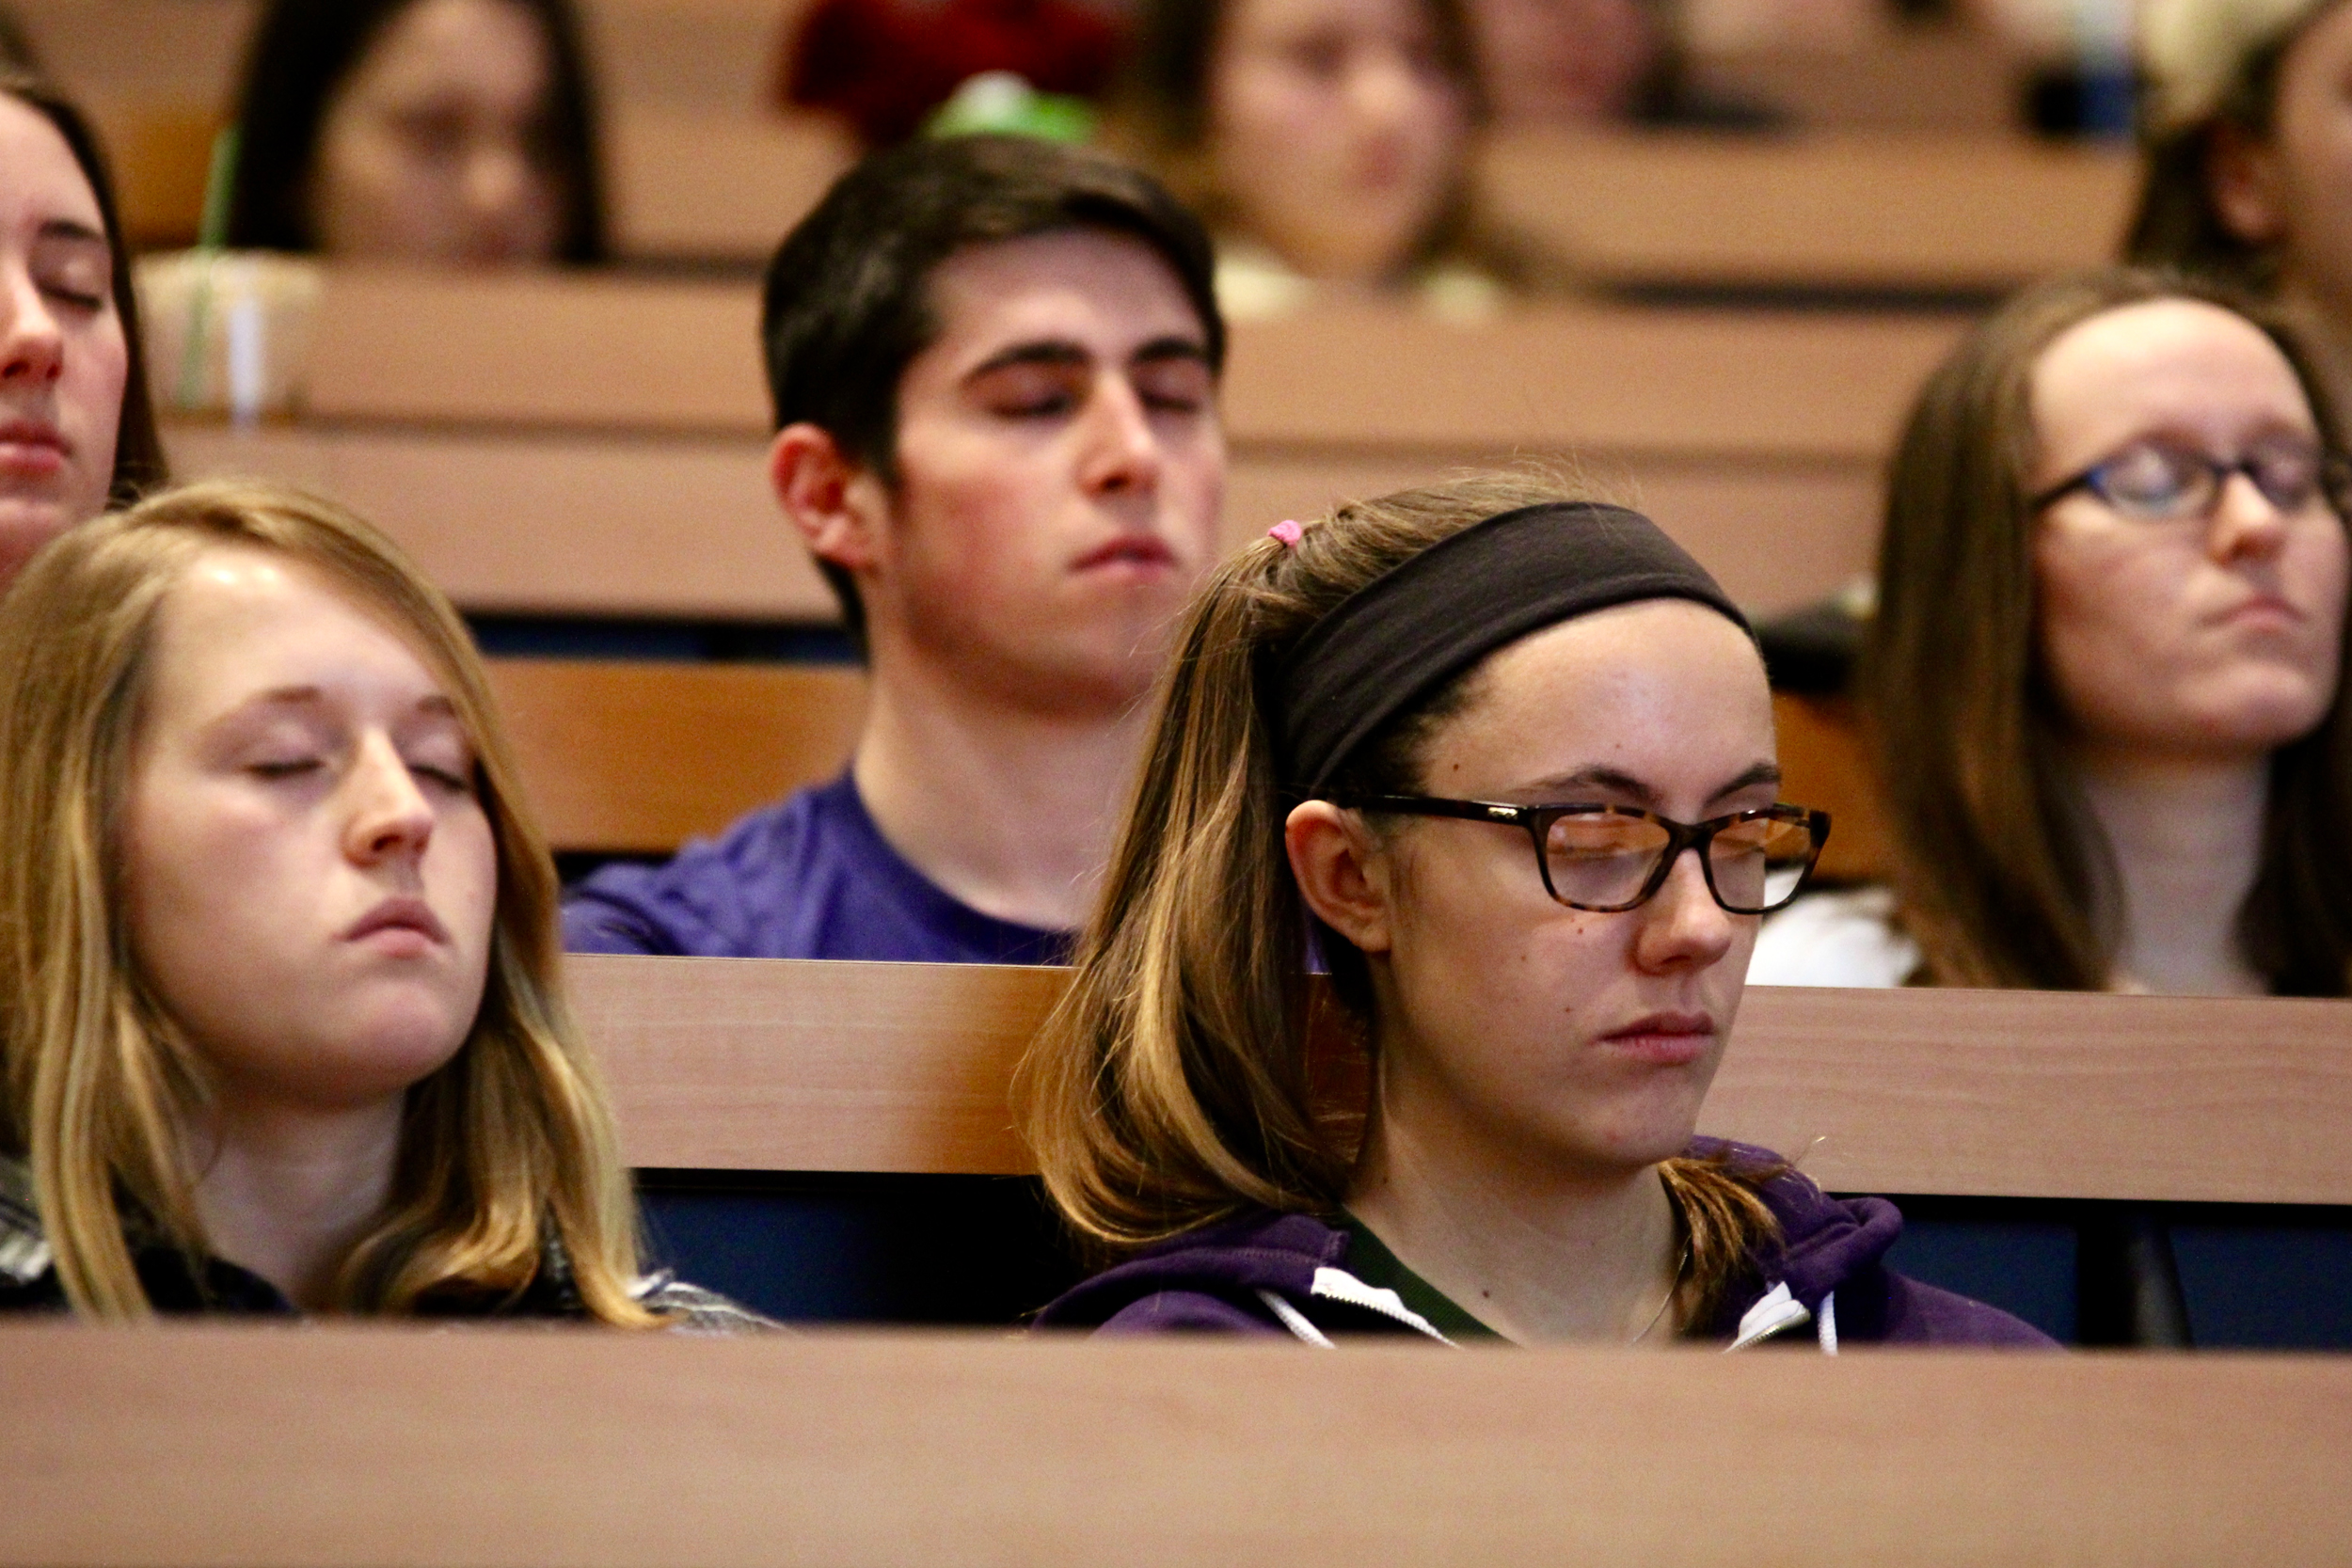 binge drinking on americas campuses essay